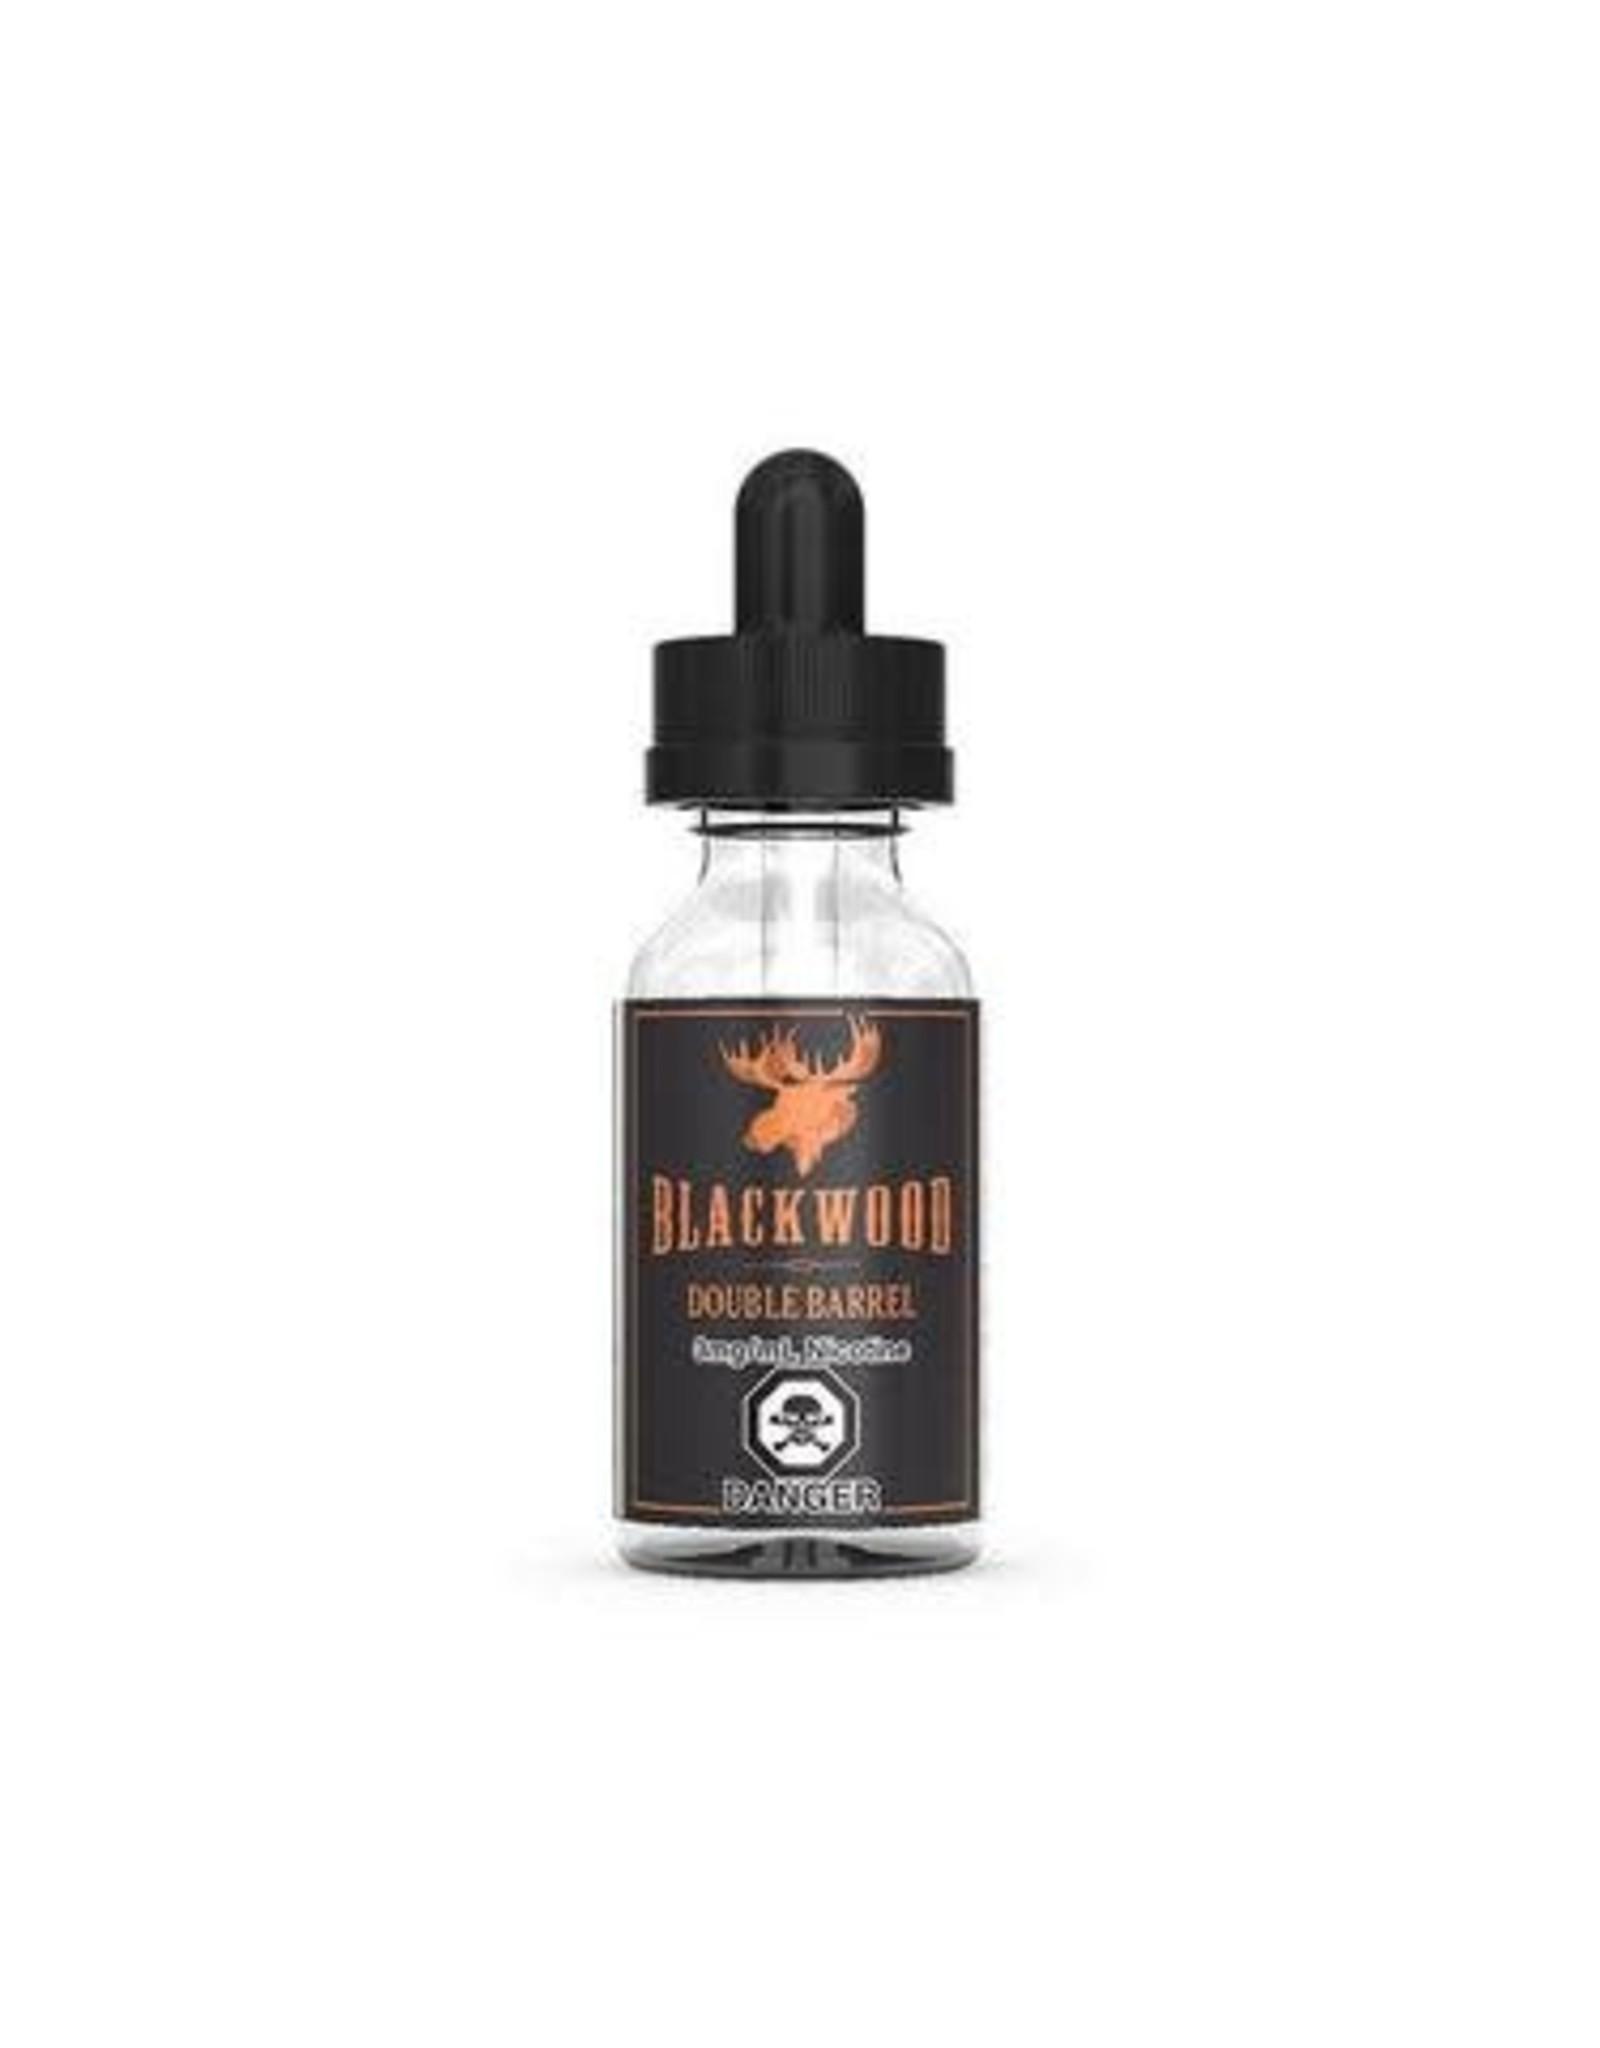 BLACKWOOD DOUBLE BARREL BY BLACKWOOD(30ML)